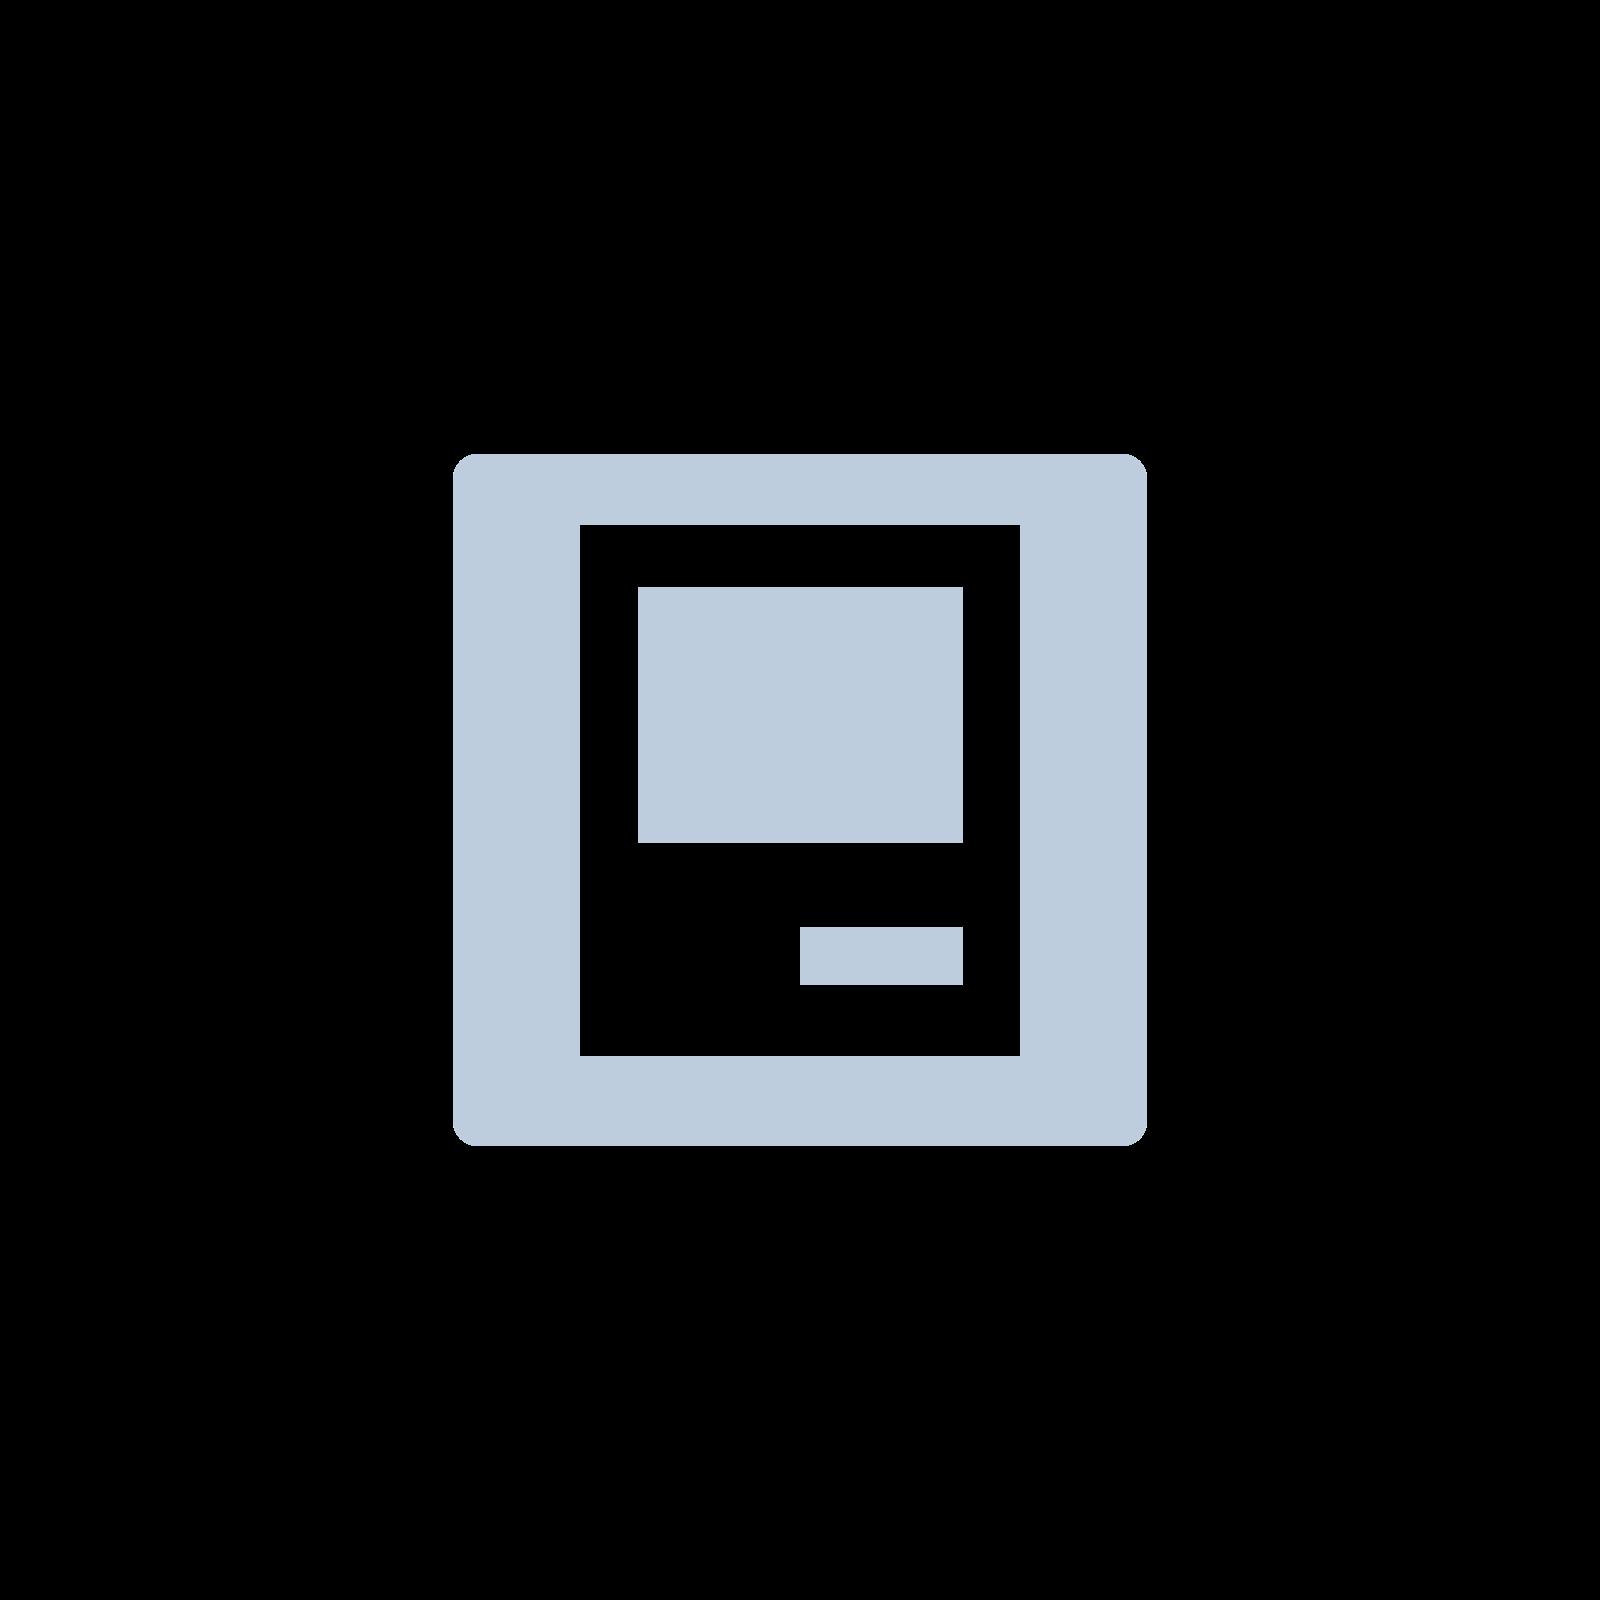 Netzteil zu Mac mini 85W PPC G4